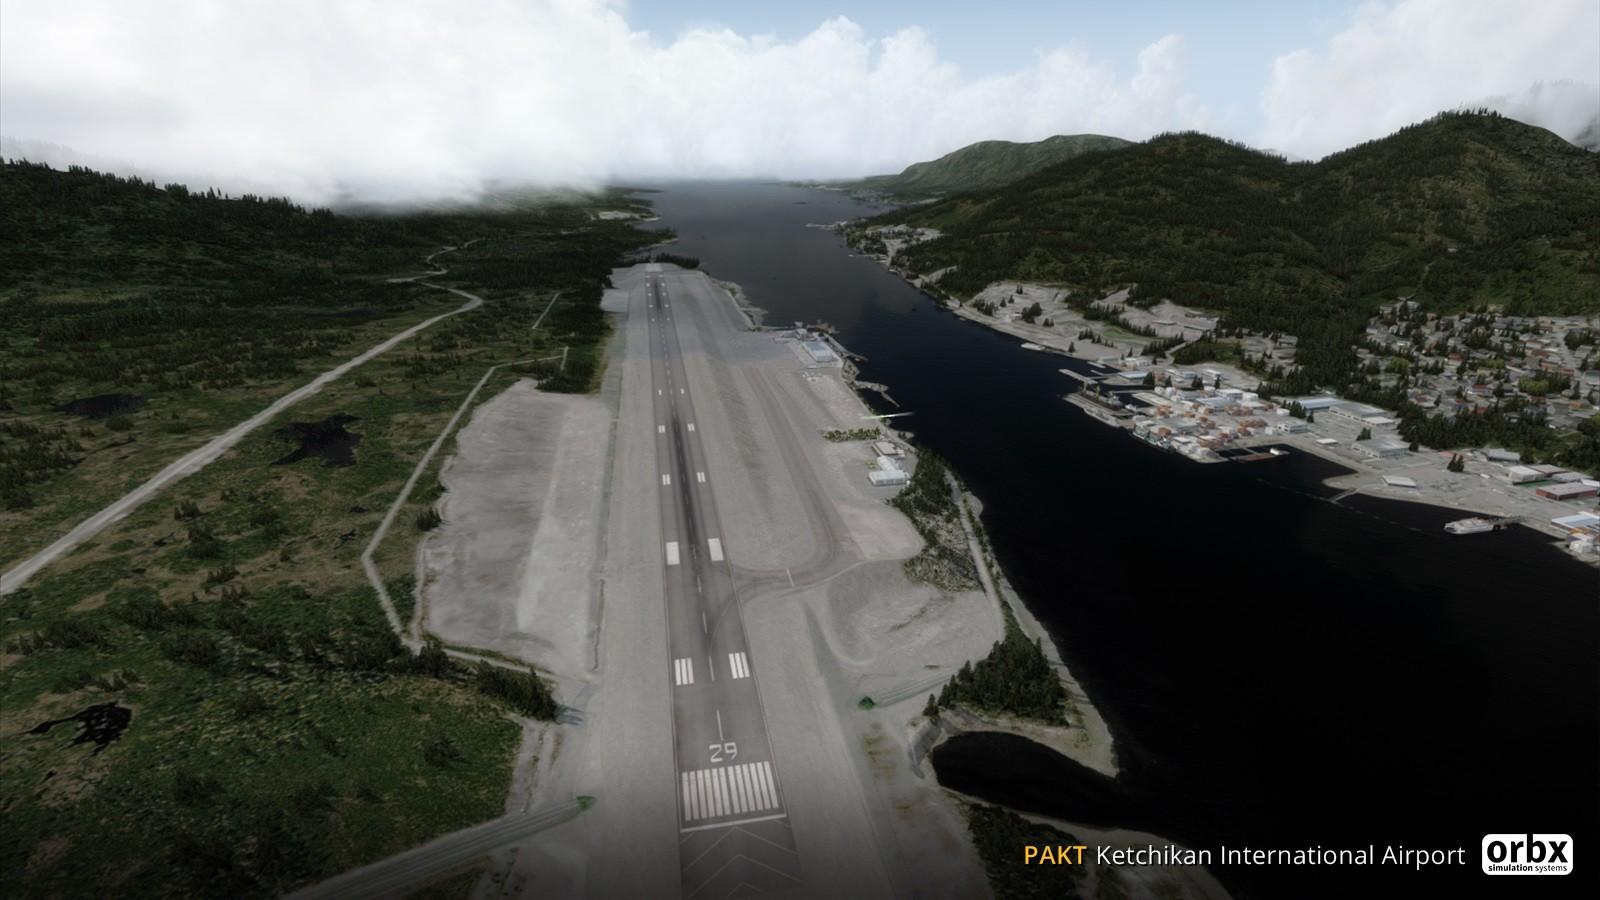 Pakt Ketchikan International Airport Orbx